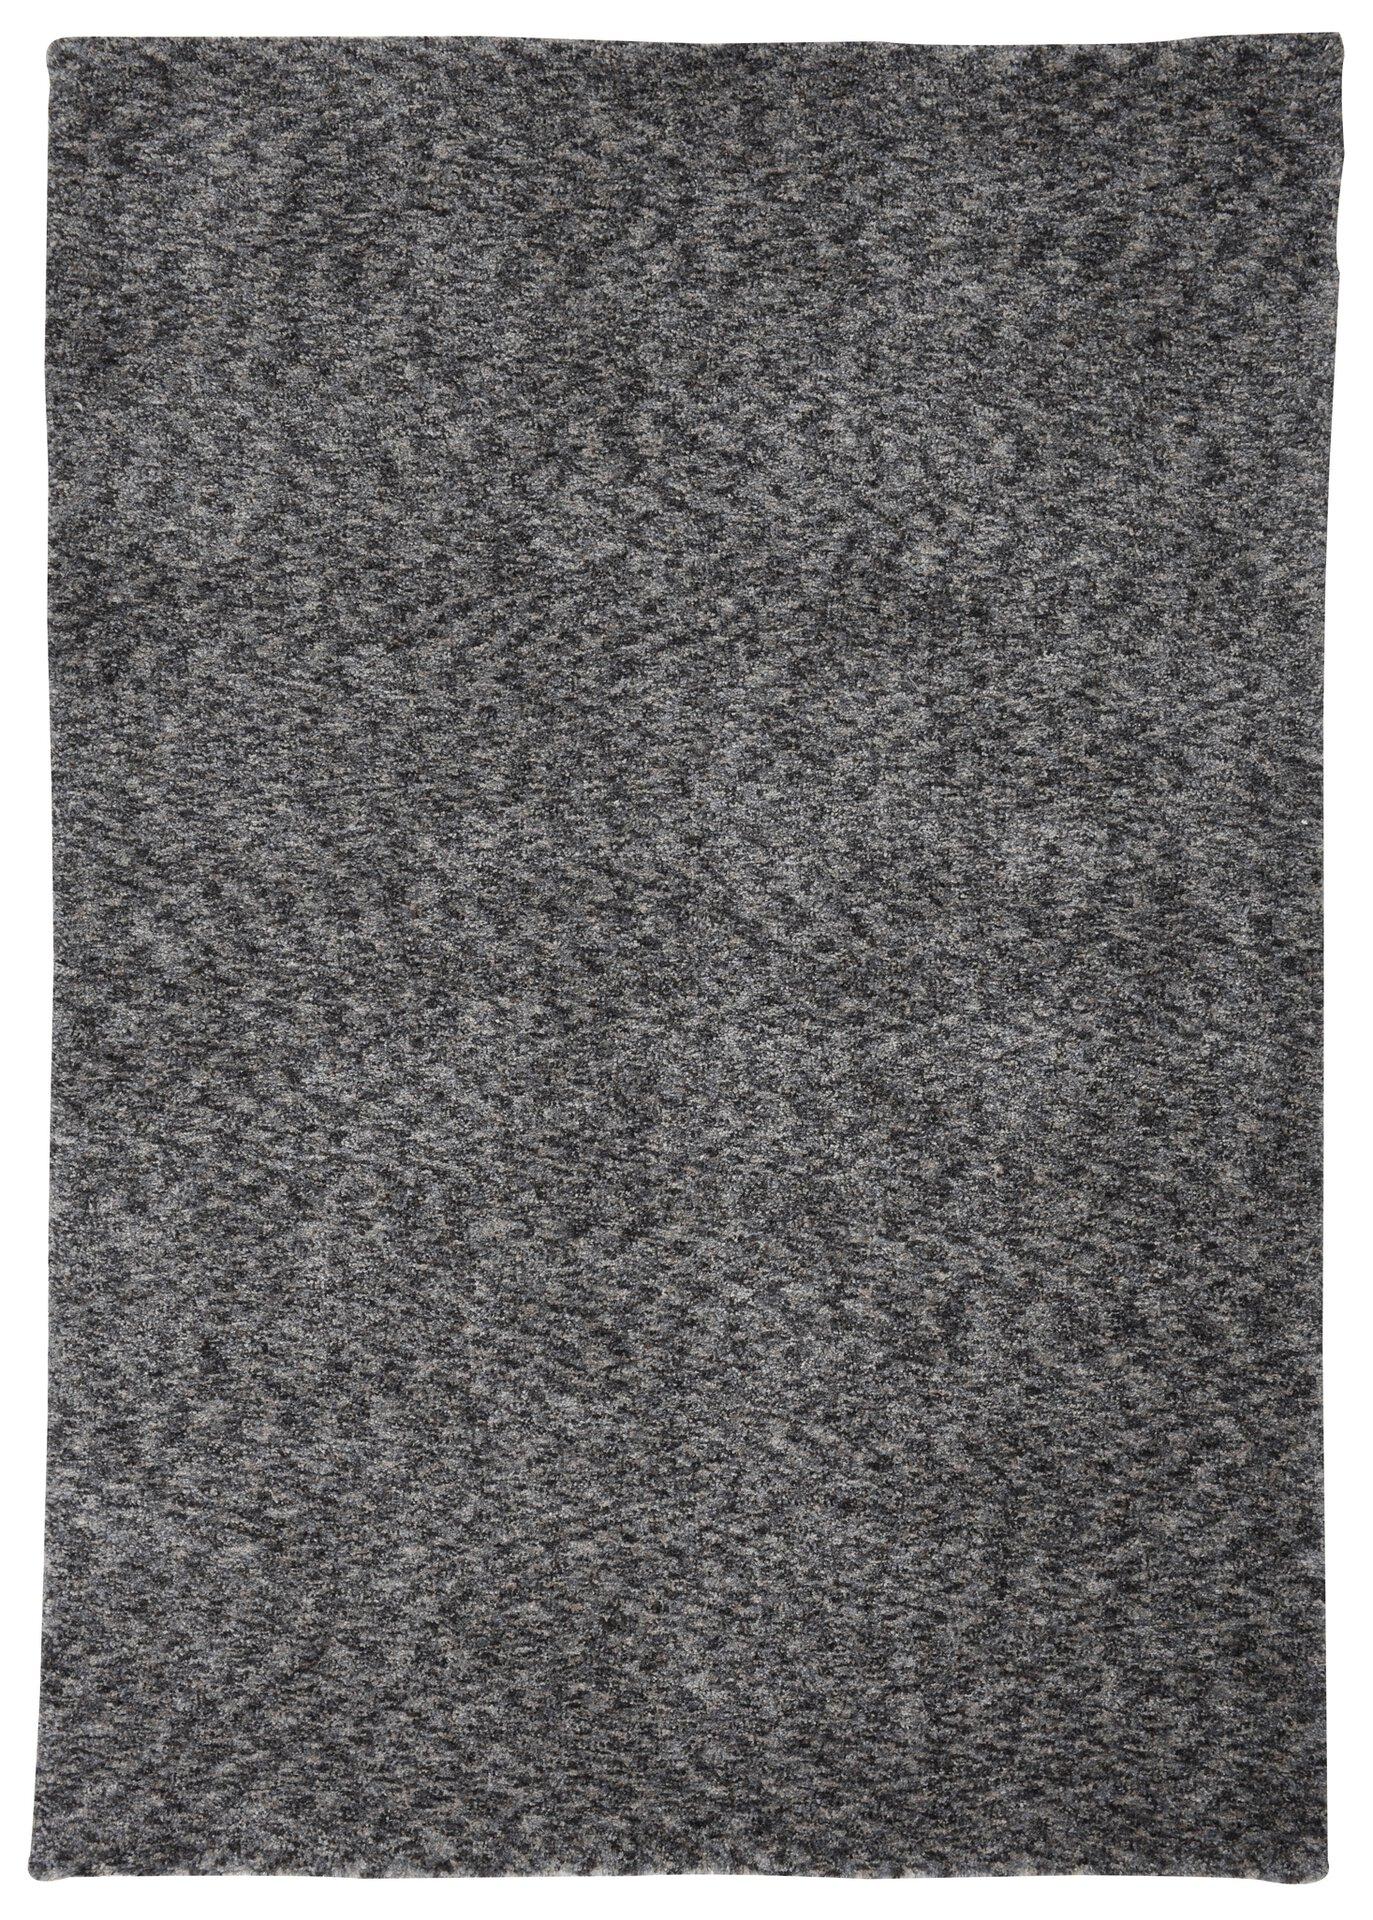 Handtuftteppich Roberto Gino Falcone Textil grau 160 x 230 cm